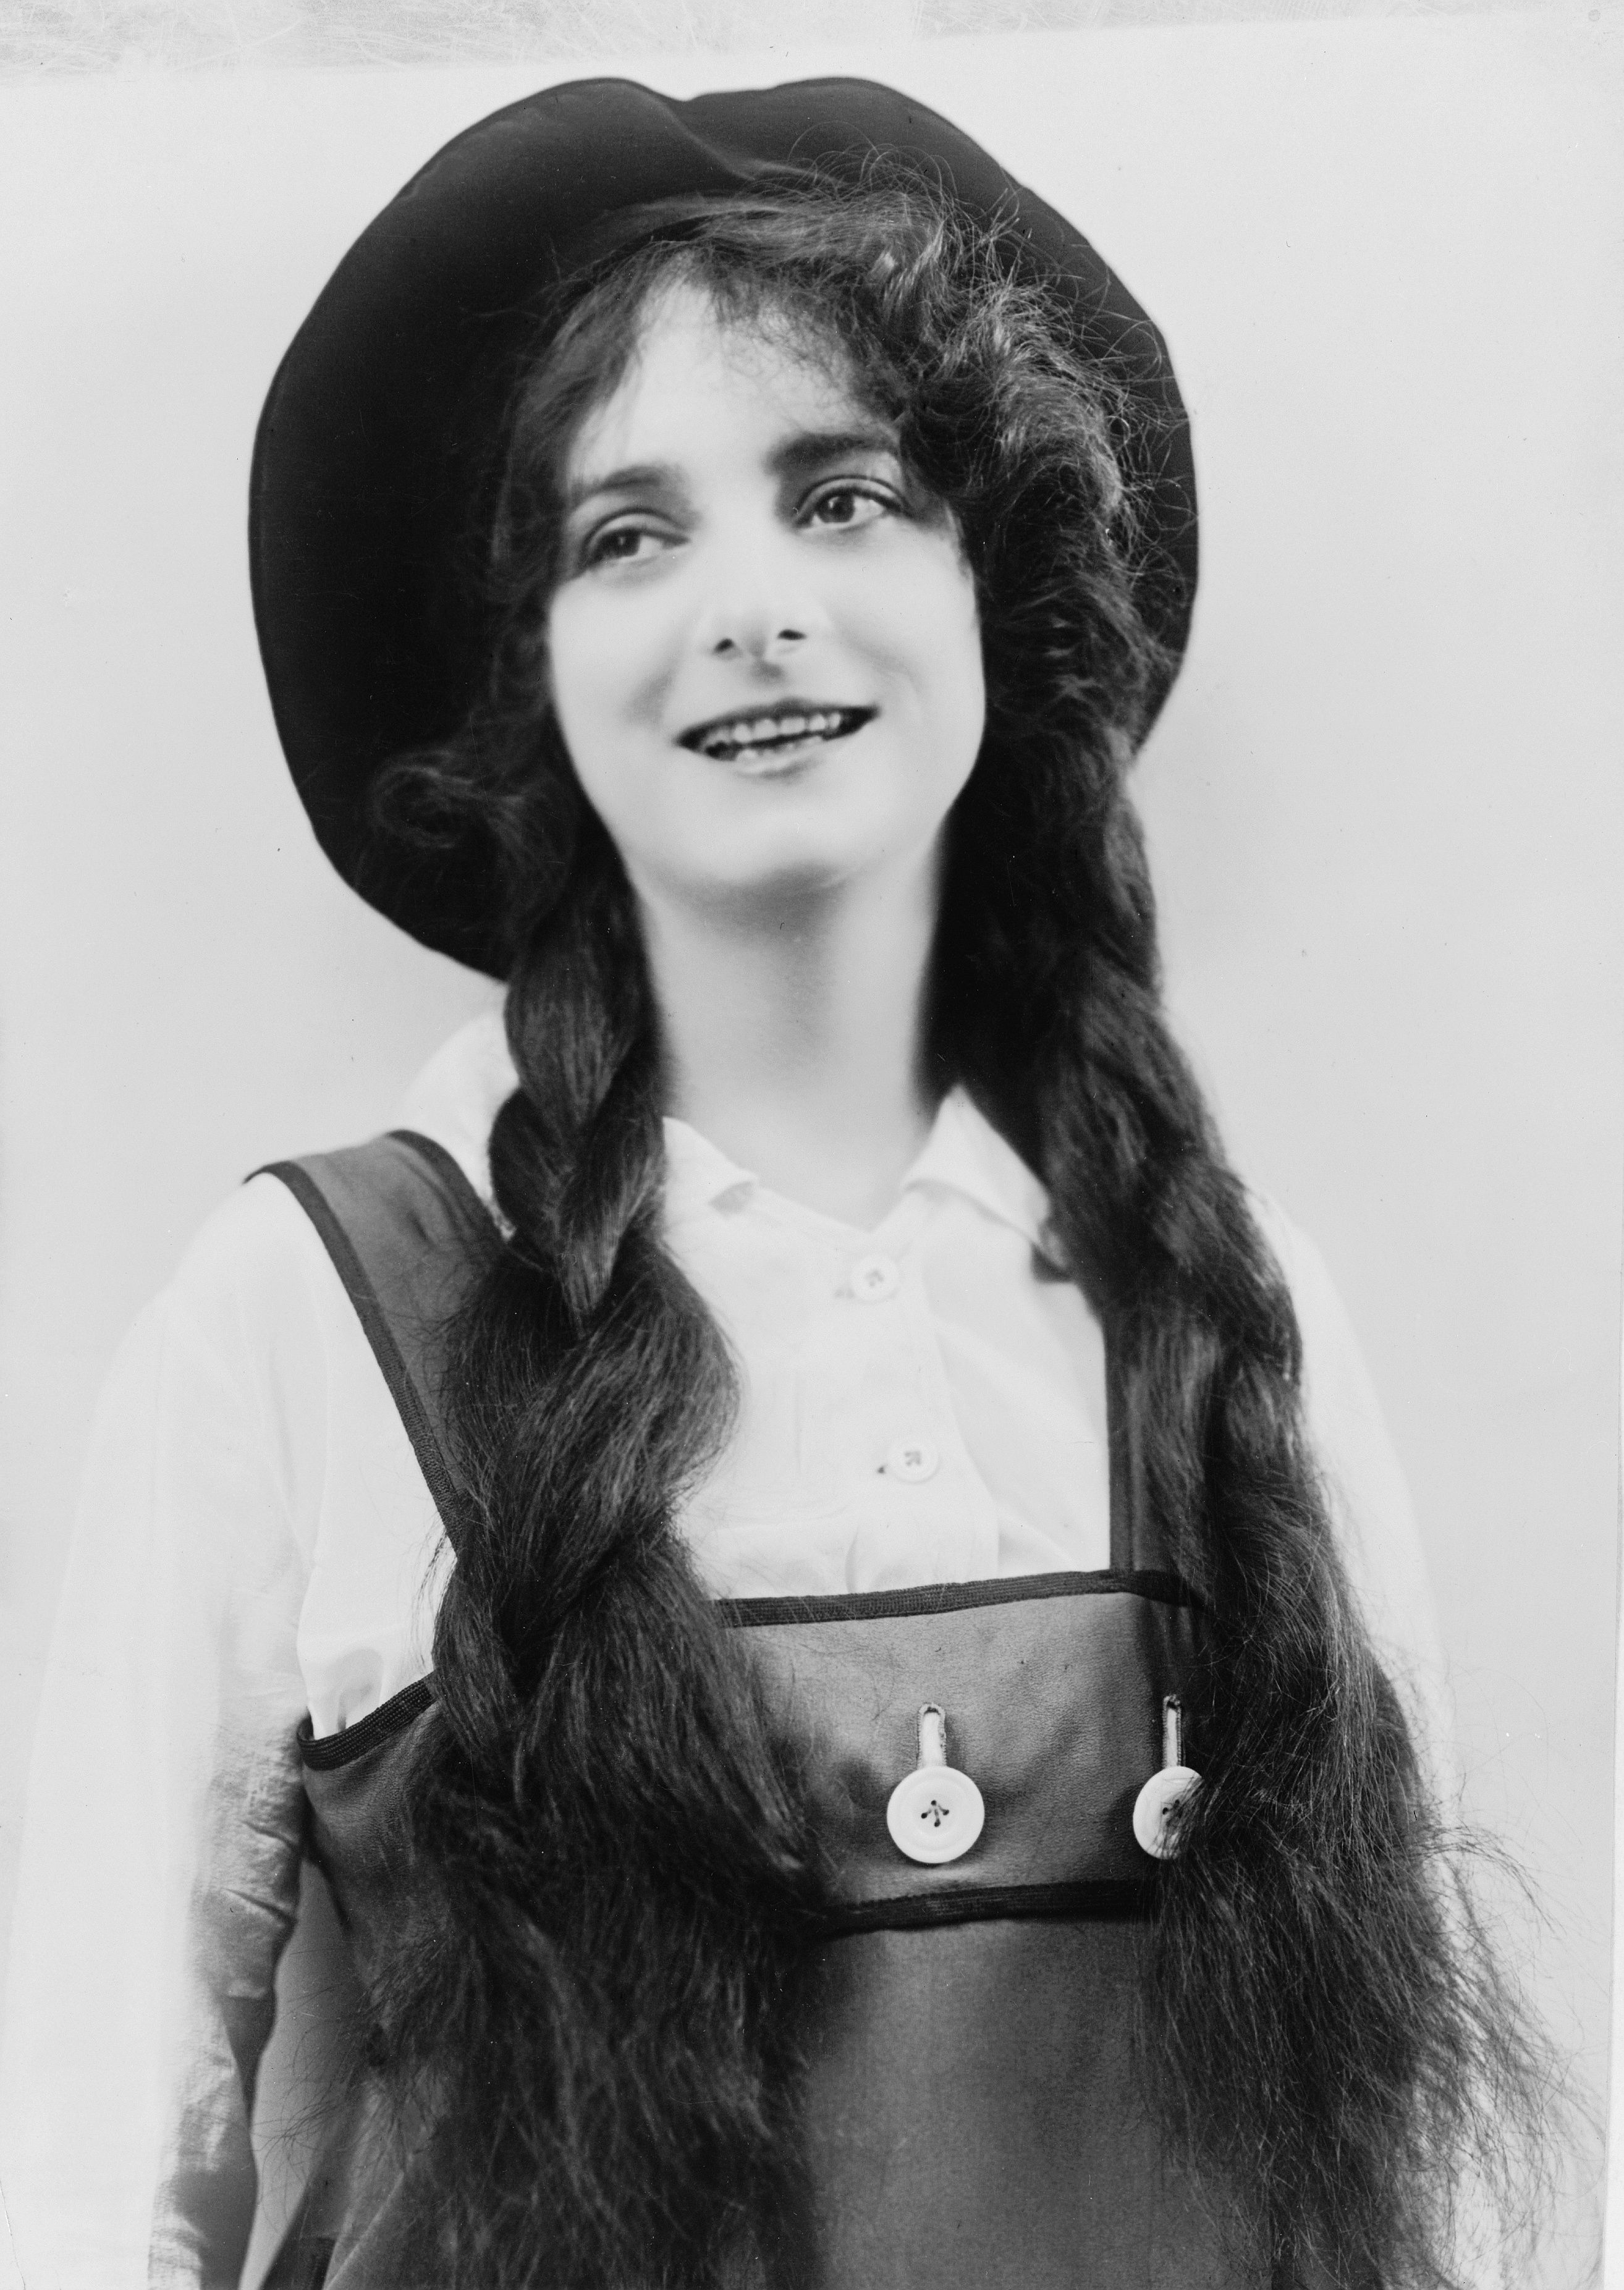 Tits Julia Dean (actress, born 1878) naked photo 2017